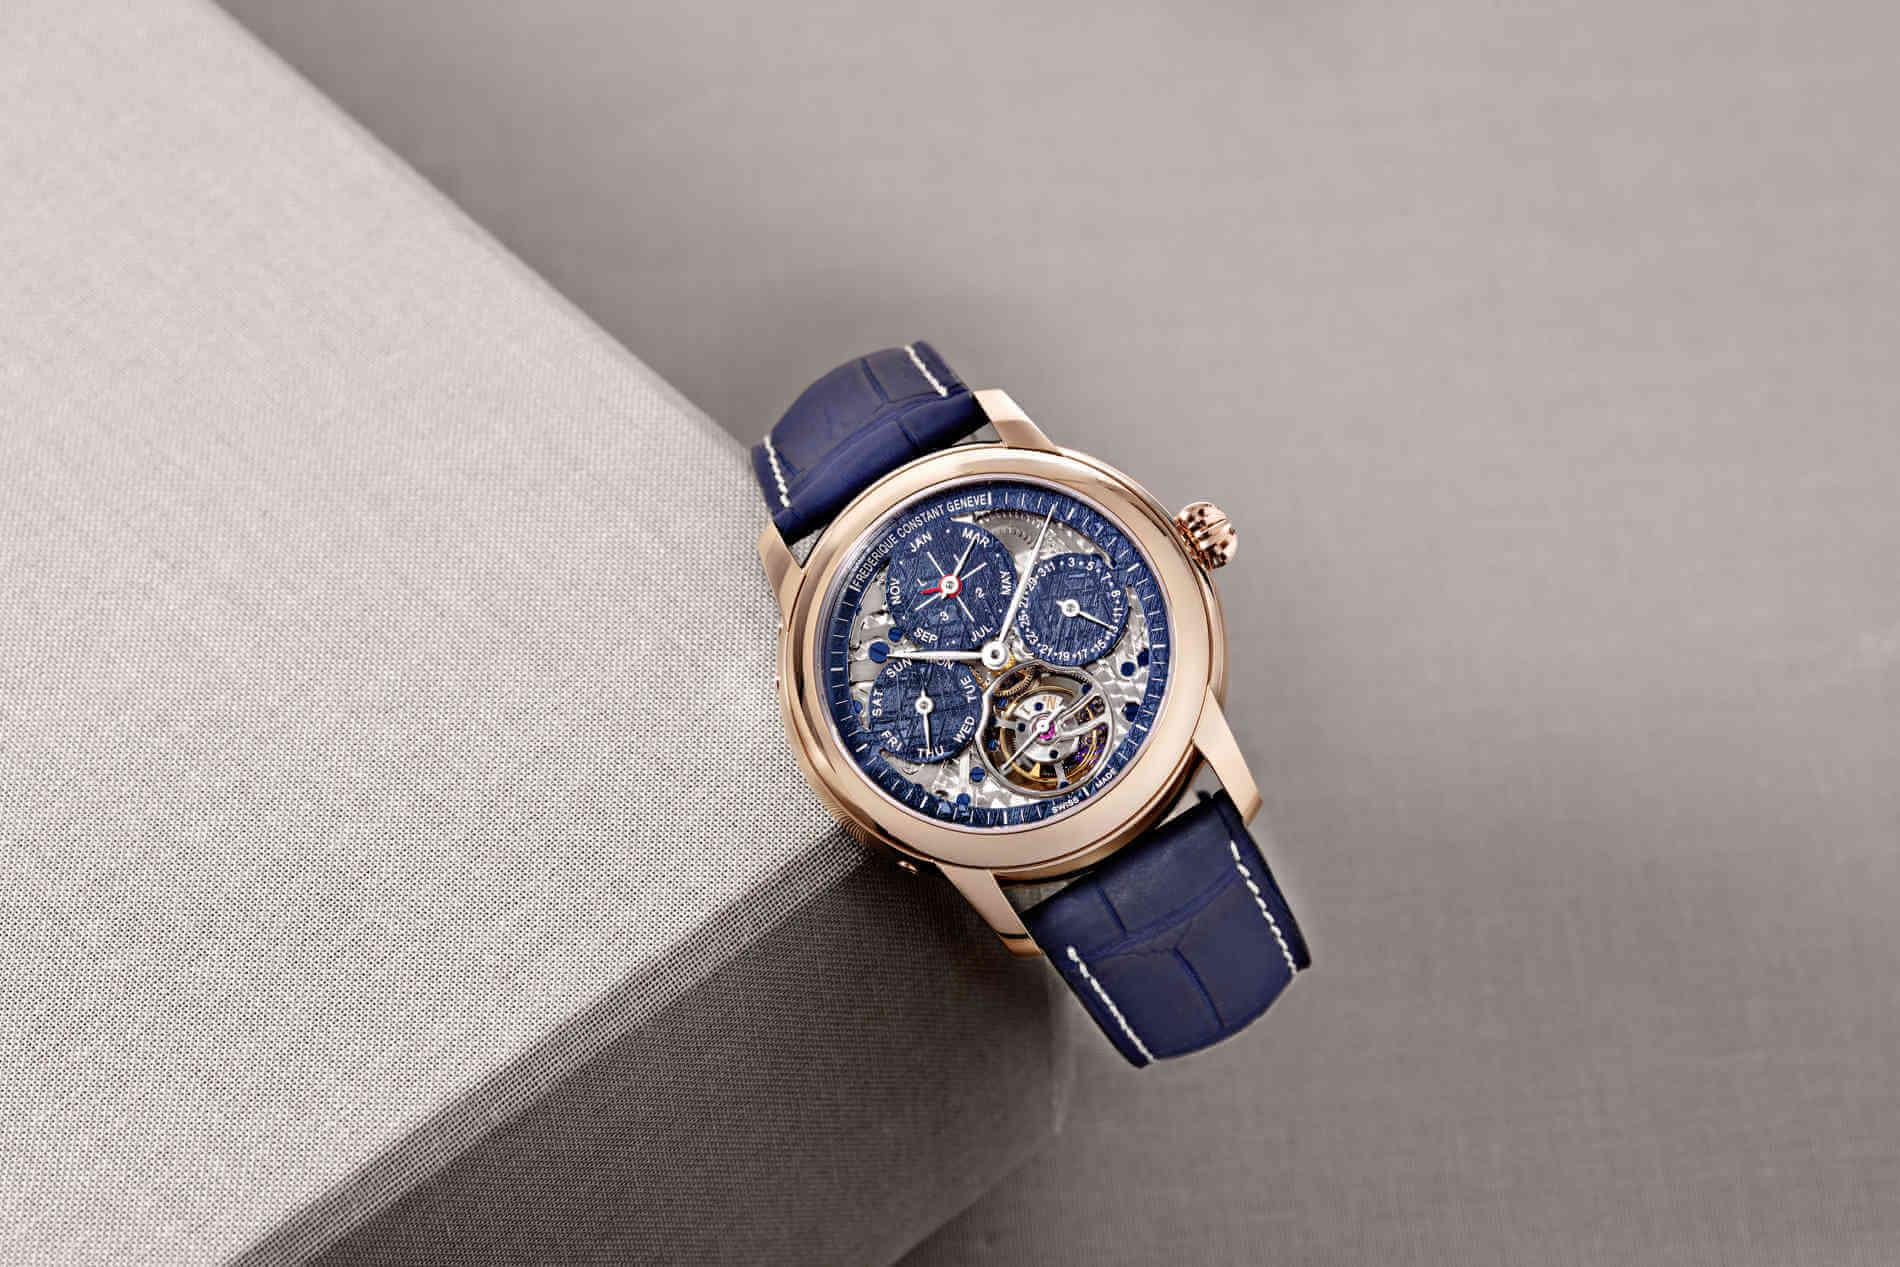 Frederique Constant Meteorite Tourbillon Perpetual Calendar Manufacture only watch